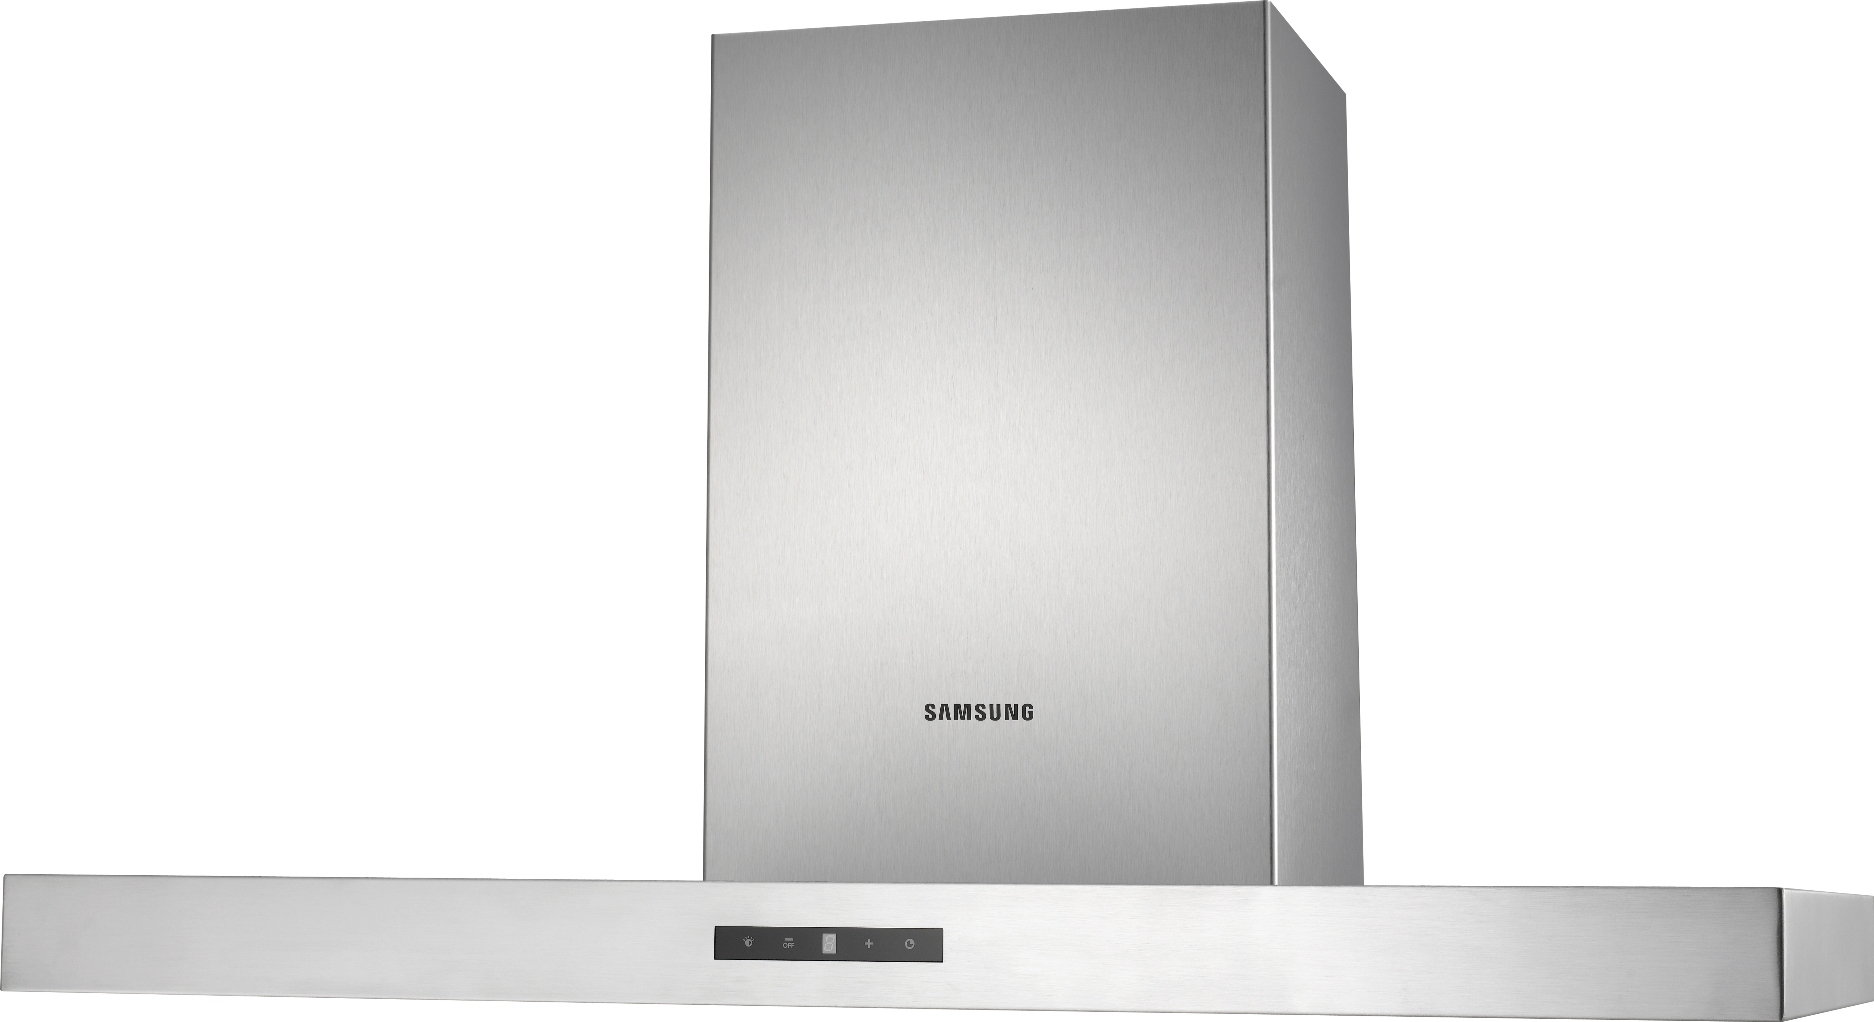 Opinie o Samsung HDC9C55TX